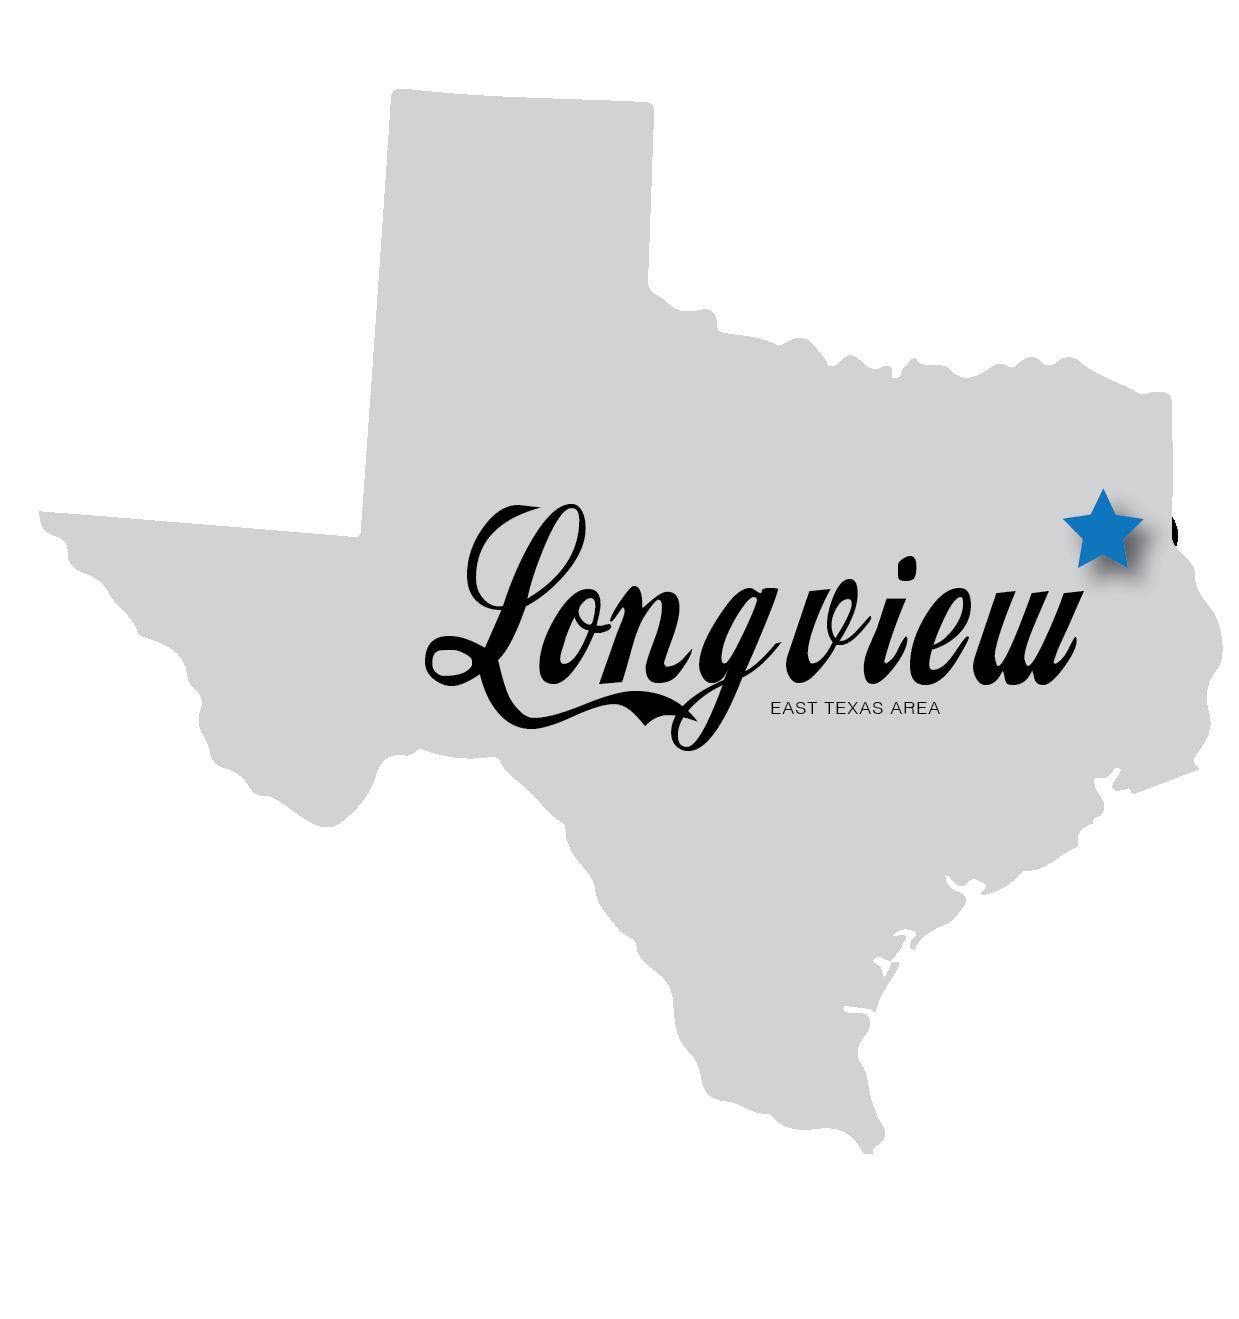 East Texas Area - Campus Pastor, Robert Brown1201 Morgan St.Longview, TX 75602